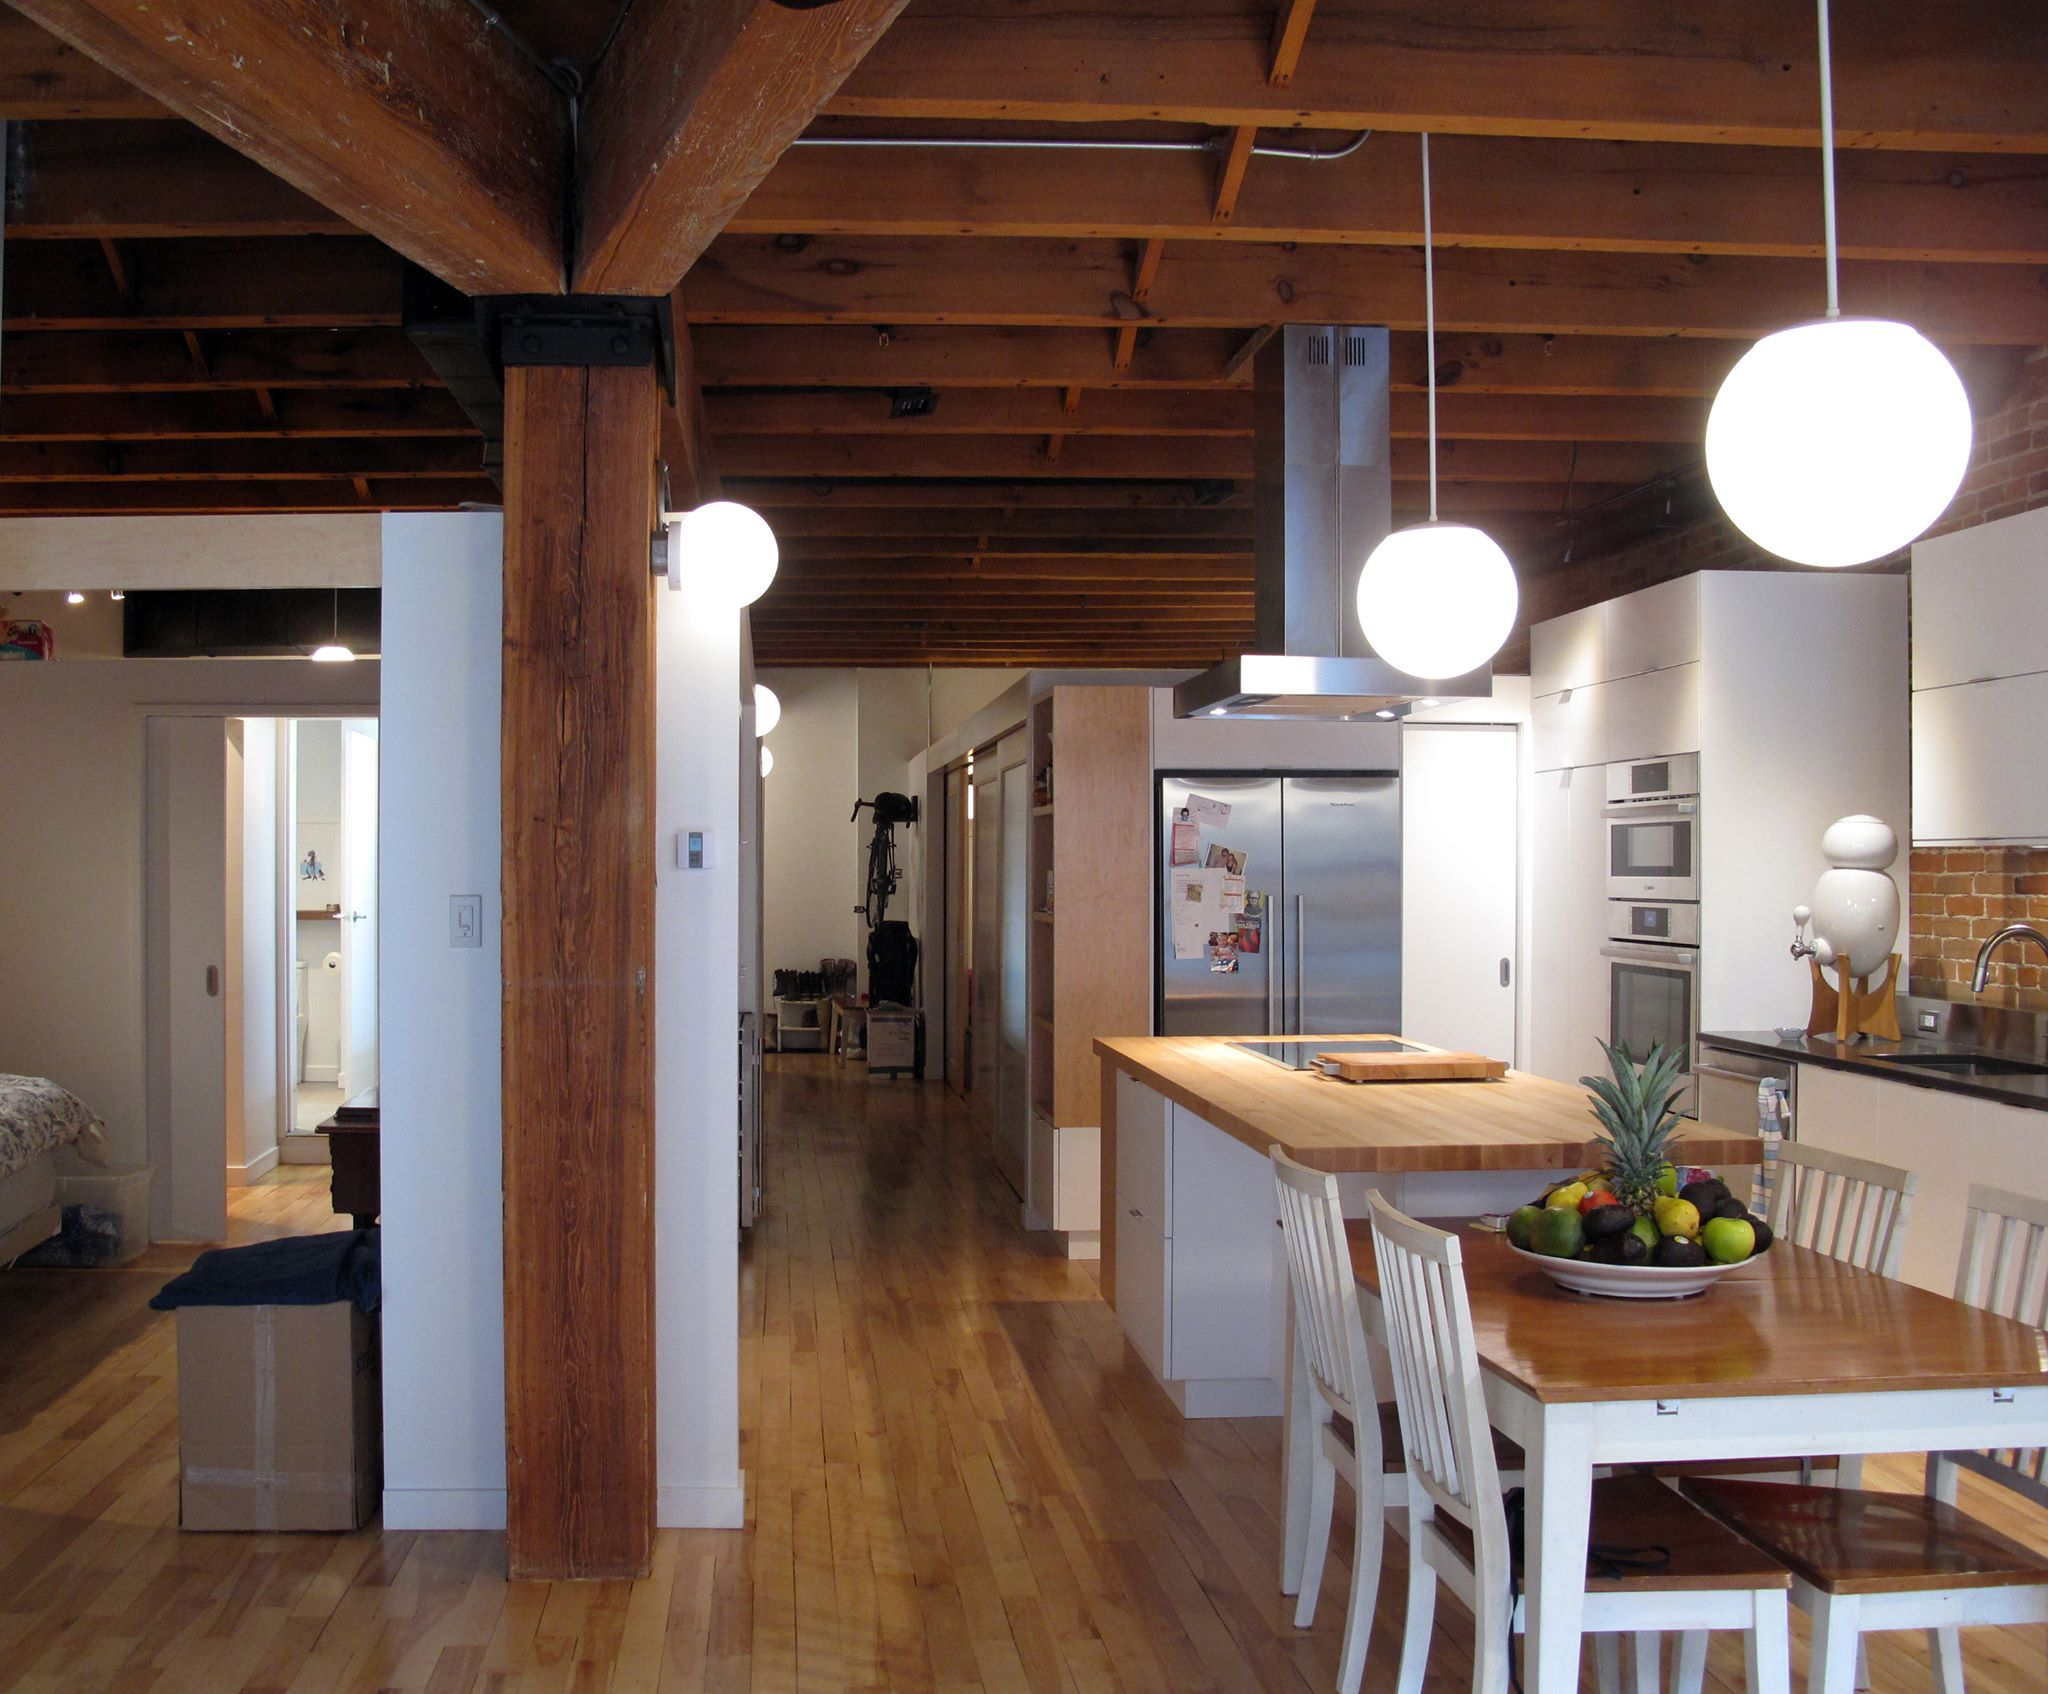 rudesign-la-caserne-cuisine-2.jpg